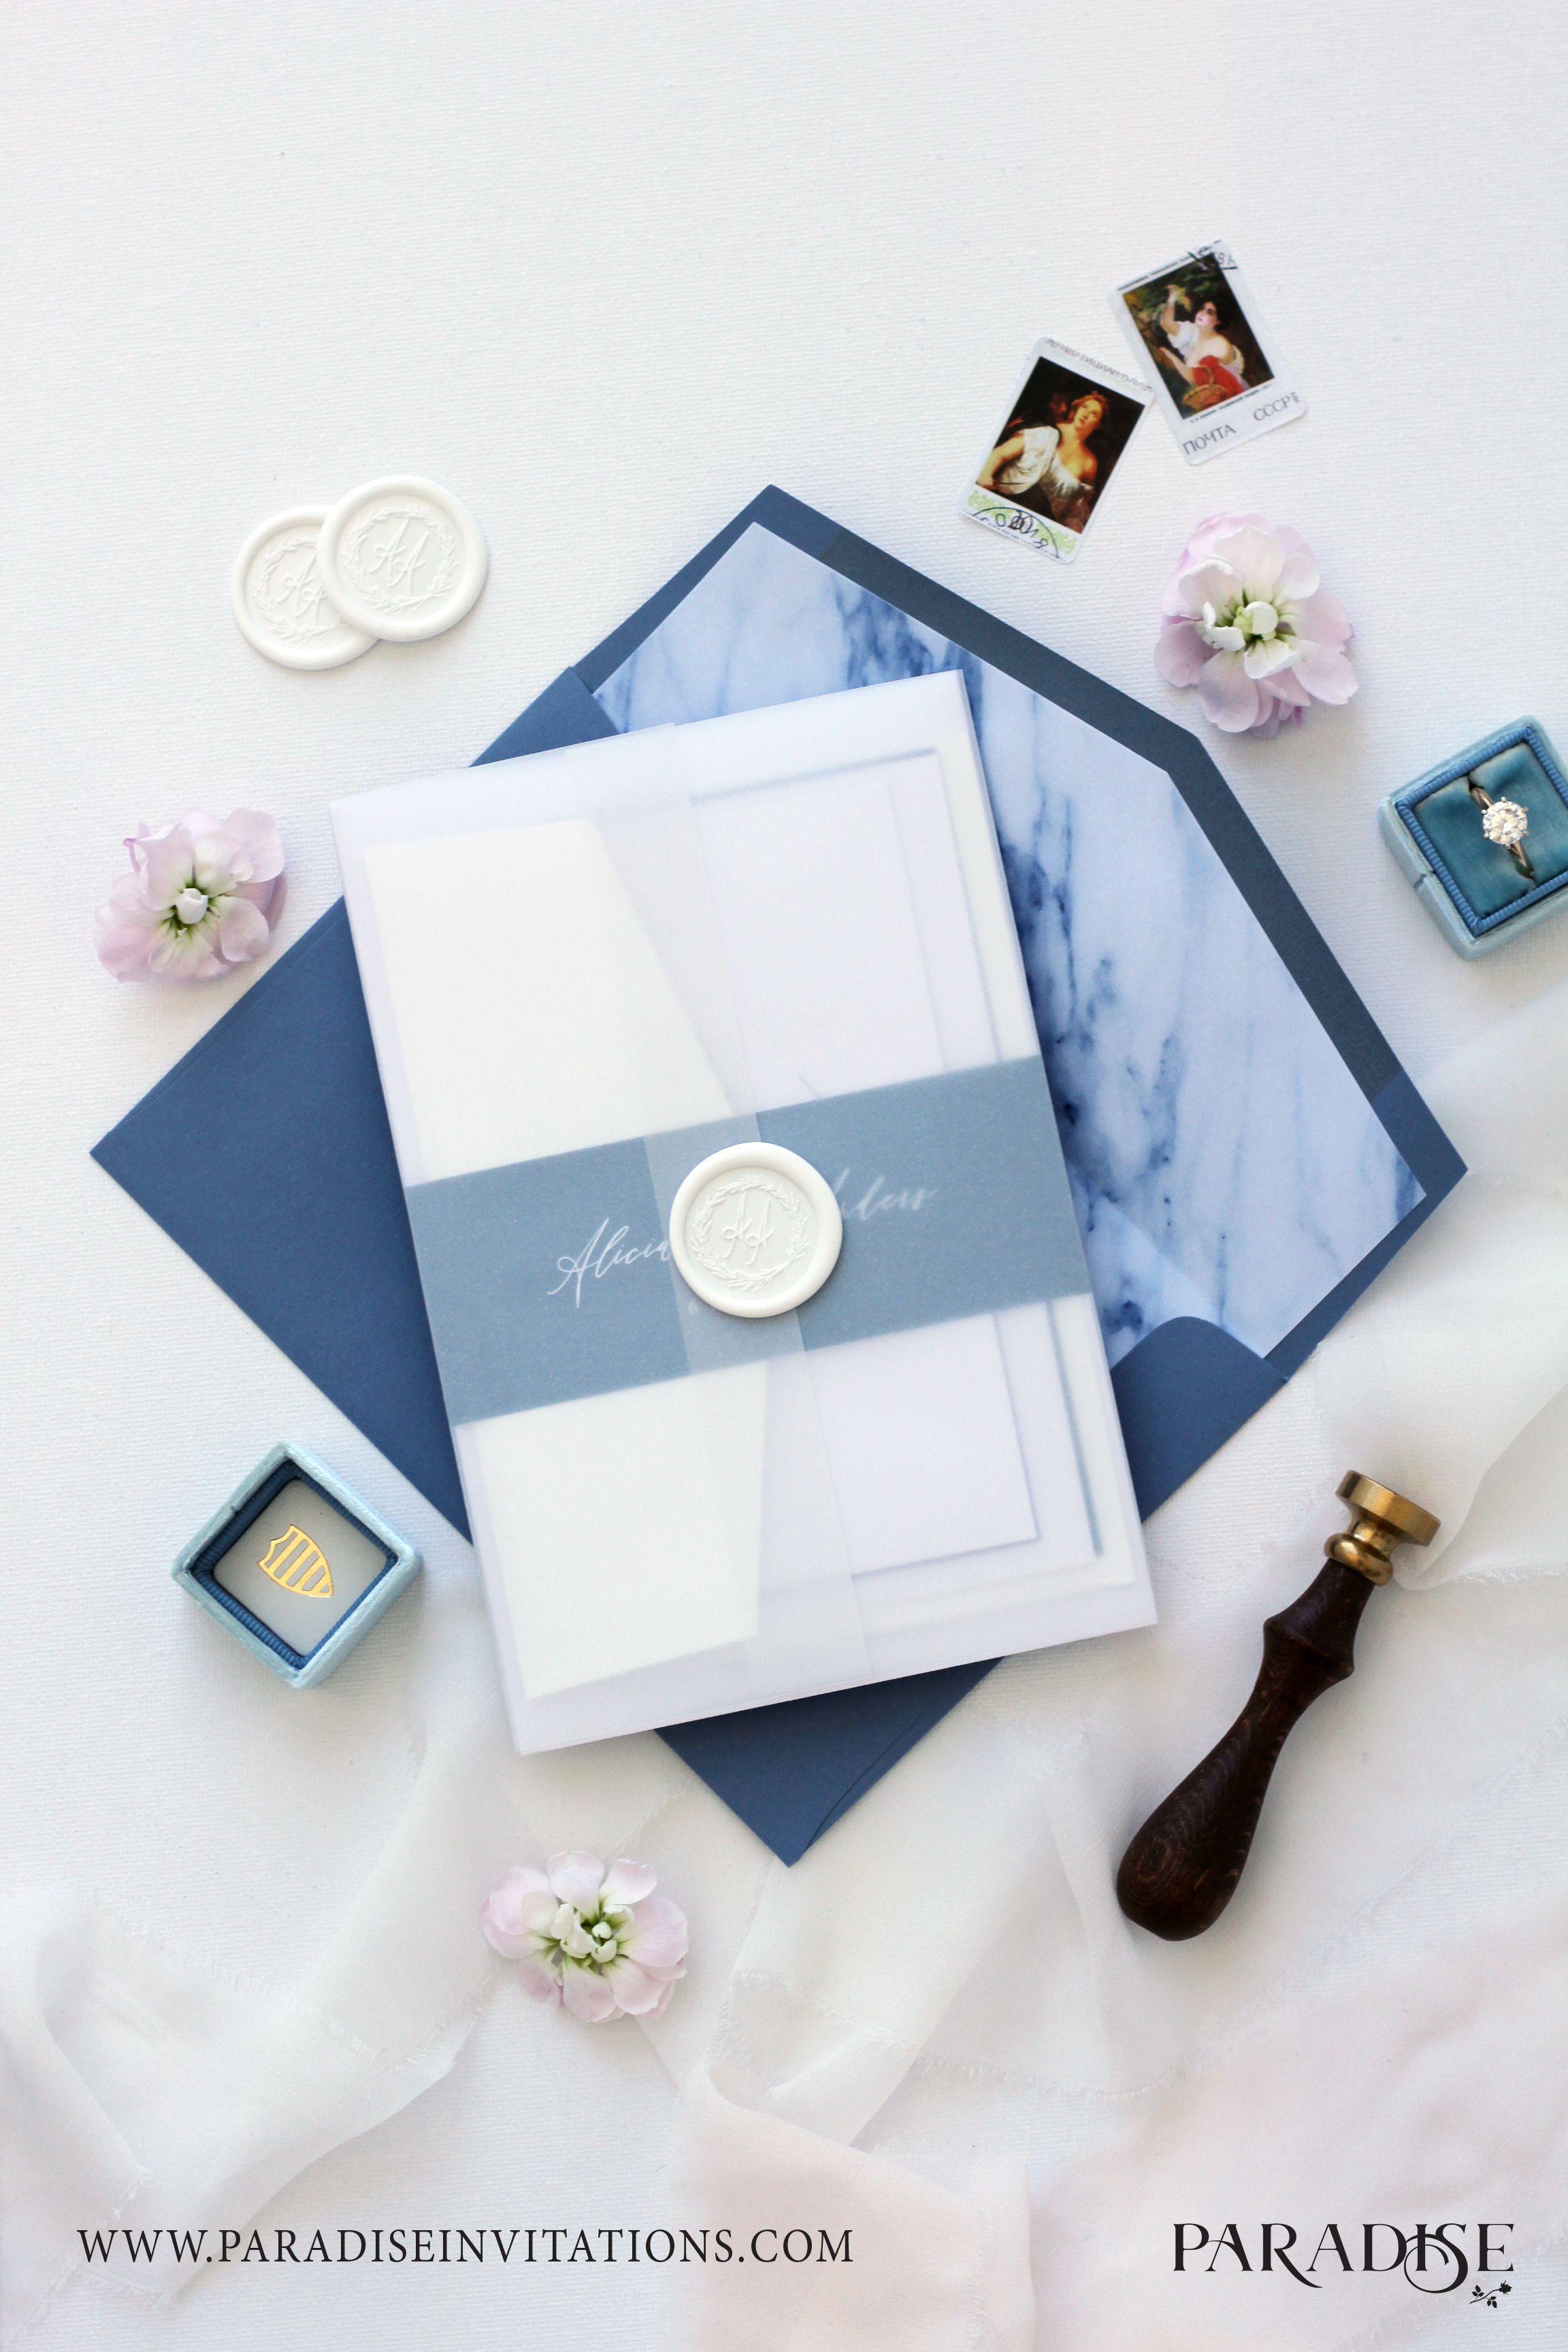 Dusty Blue Marble Texture Wedding Invitation Wedding Invitation Weddinginvitatio Wedding Invitation Sets Wedding Invitations Free Wedding Invitation Samples